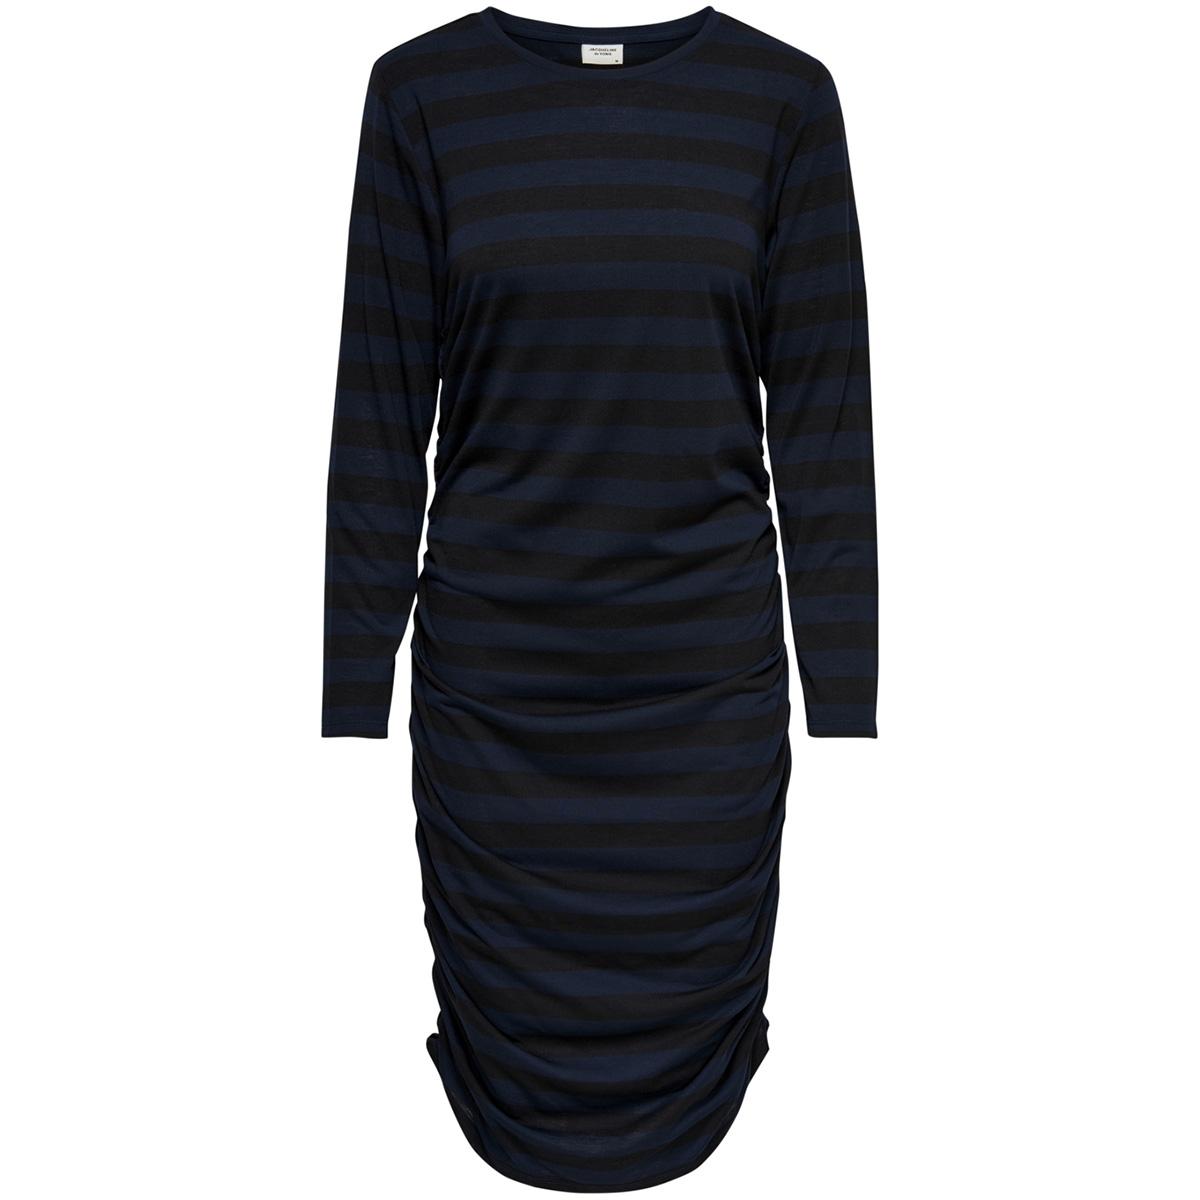 jdyrosa l/s dress jrs 15160473 jacqueline de yong jurk black/dark sapphire